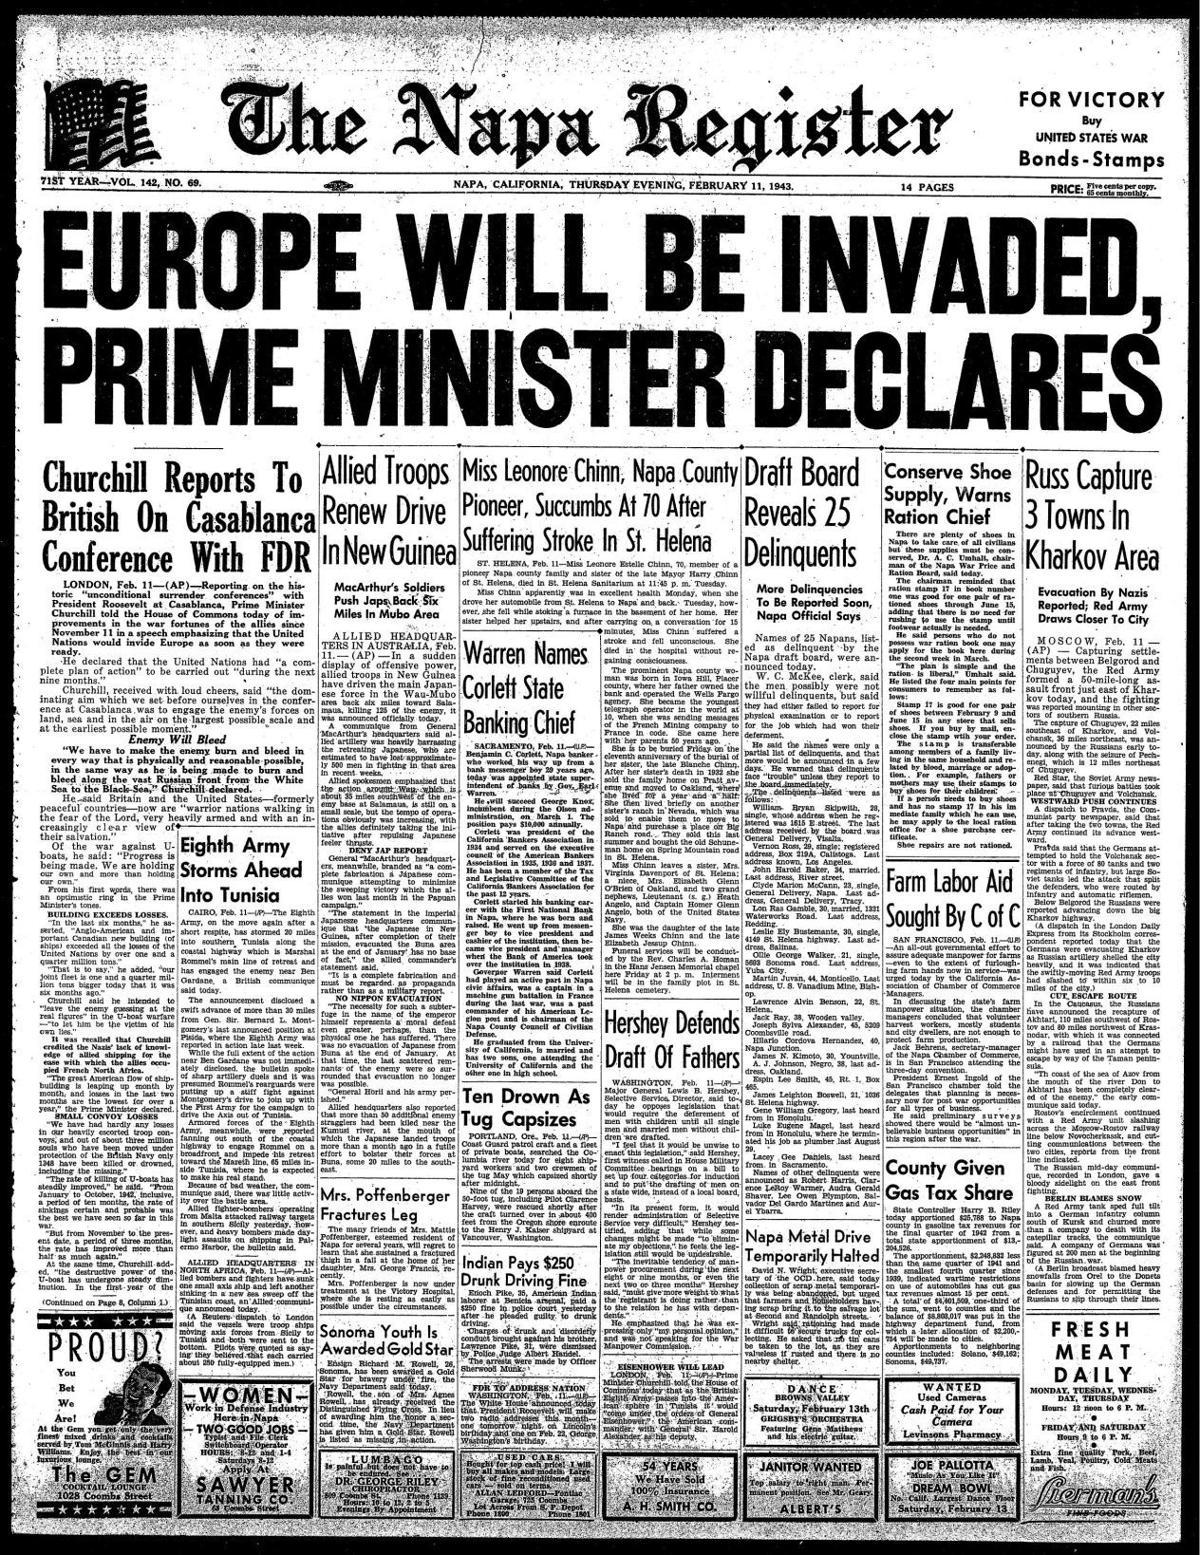 Feb. 11, 1943